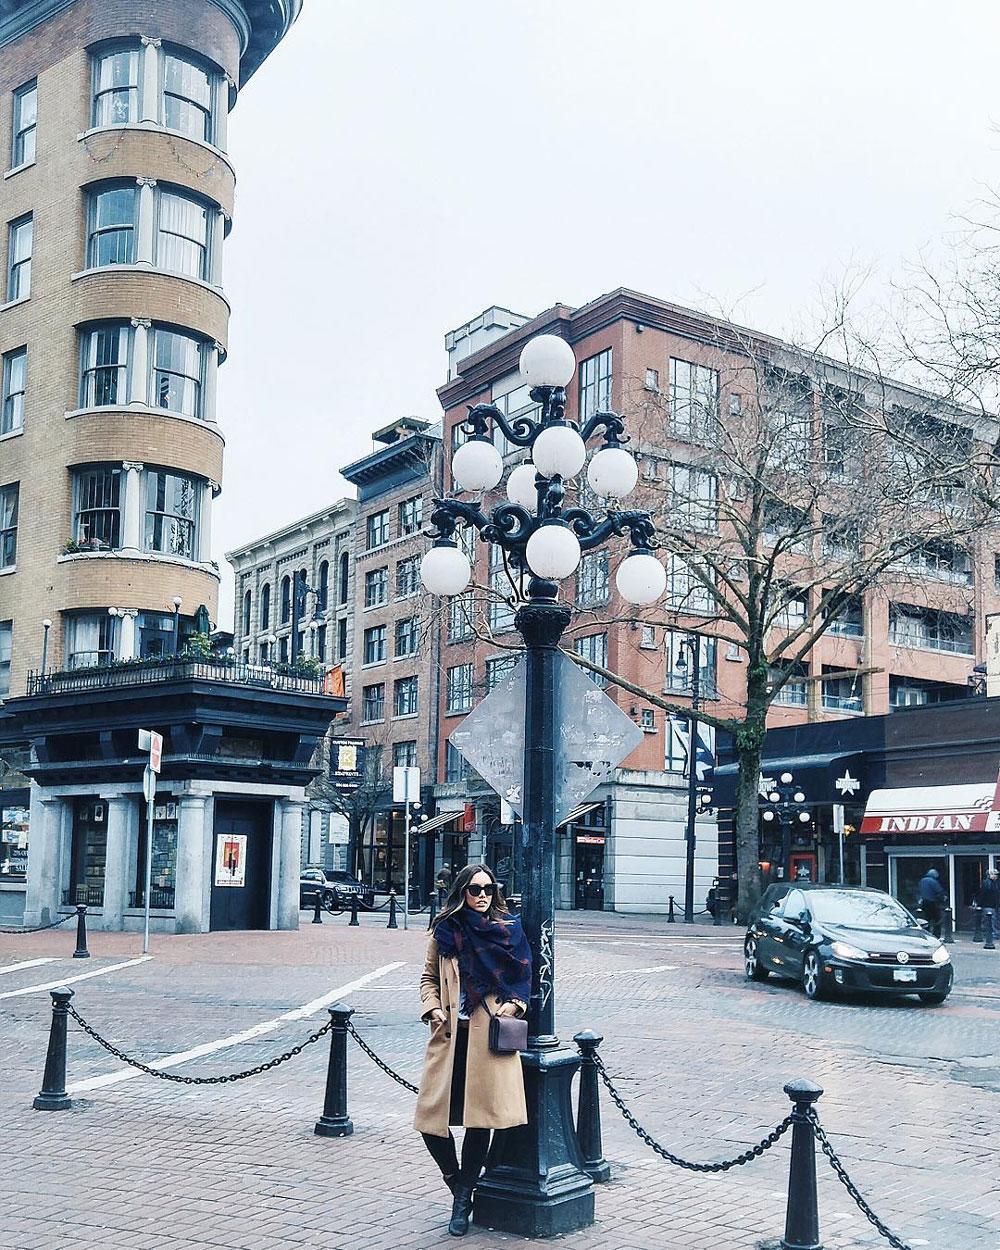 Best Instagram locations in Vancouver - Stanley Park, Gastown steam clock, Granville Island, Lynn Canyon Park, Lynn Canyon Suspension Bridge, Quarry Rock view, Fairview Sea Wall, Third Beach